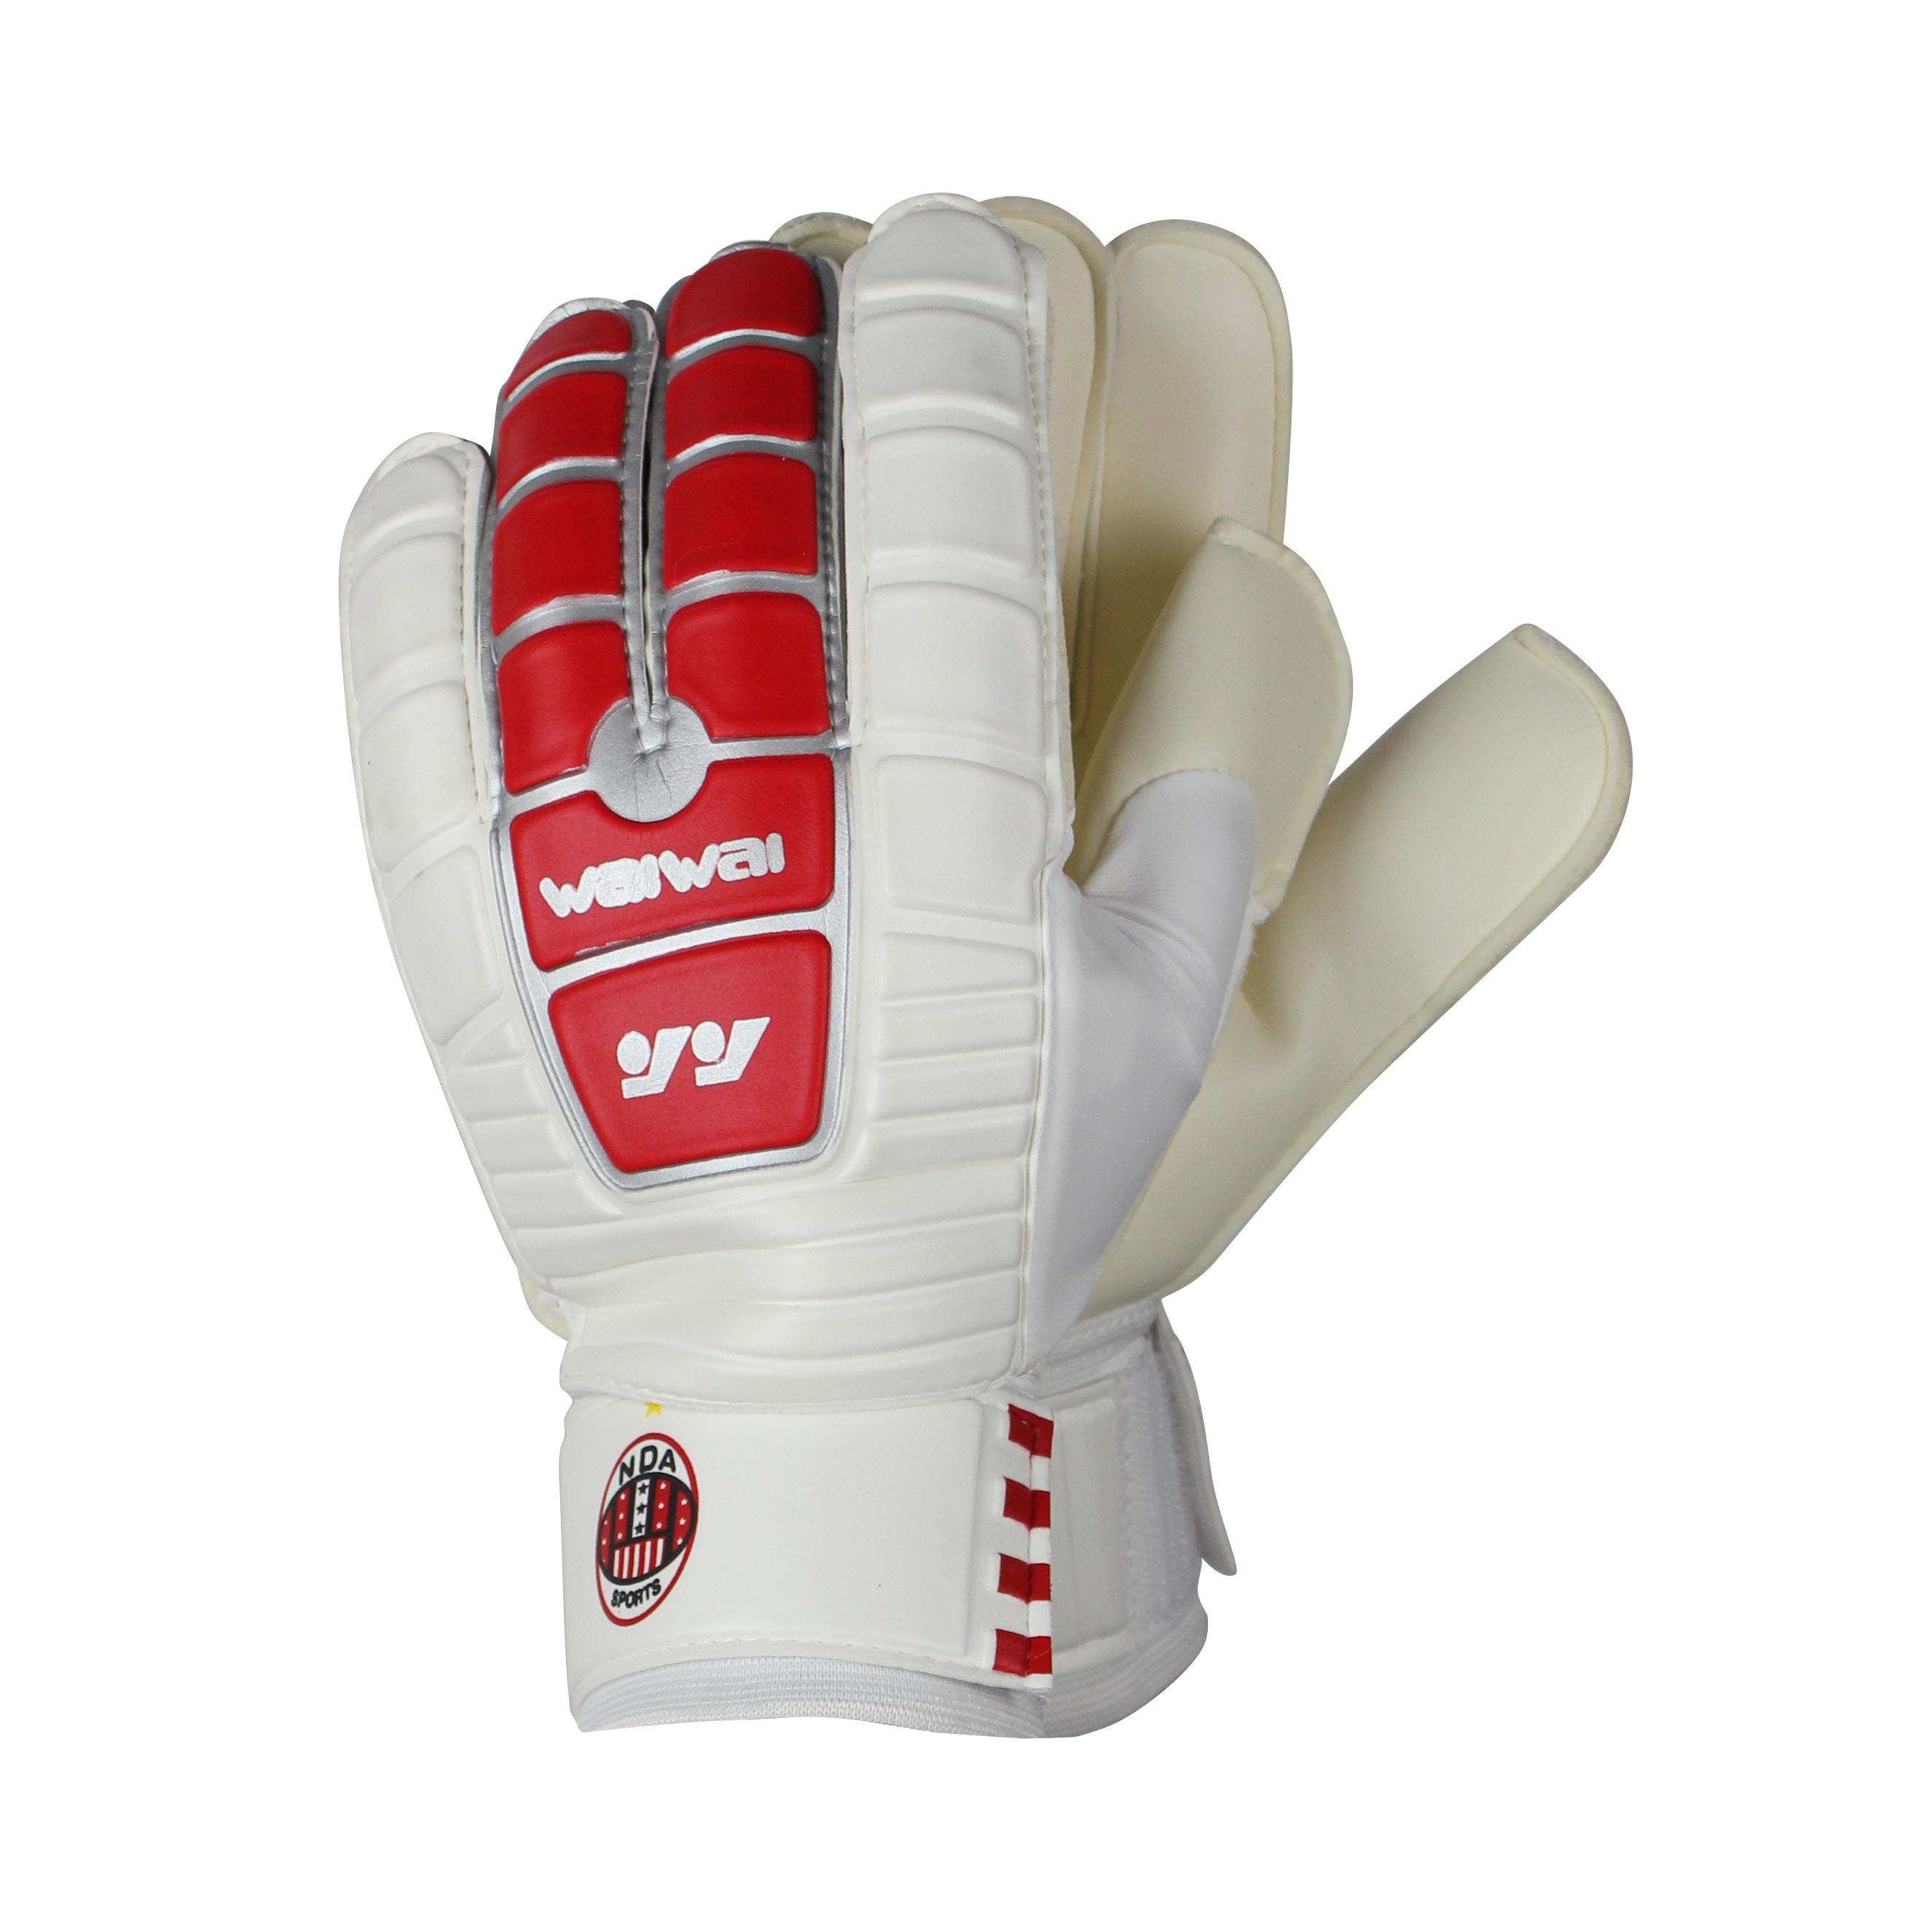 907 top goalkeeper gloves professional football goalkeeper gloves finger band with finger protection finger safe(China (Mainland))